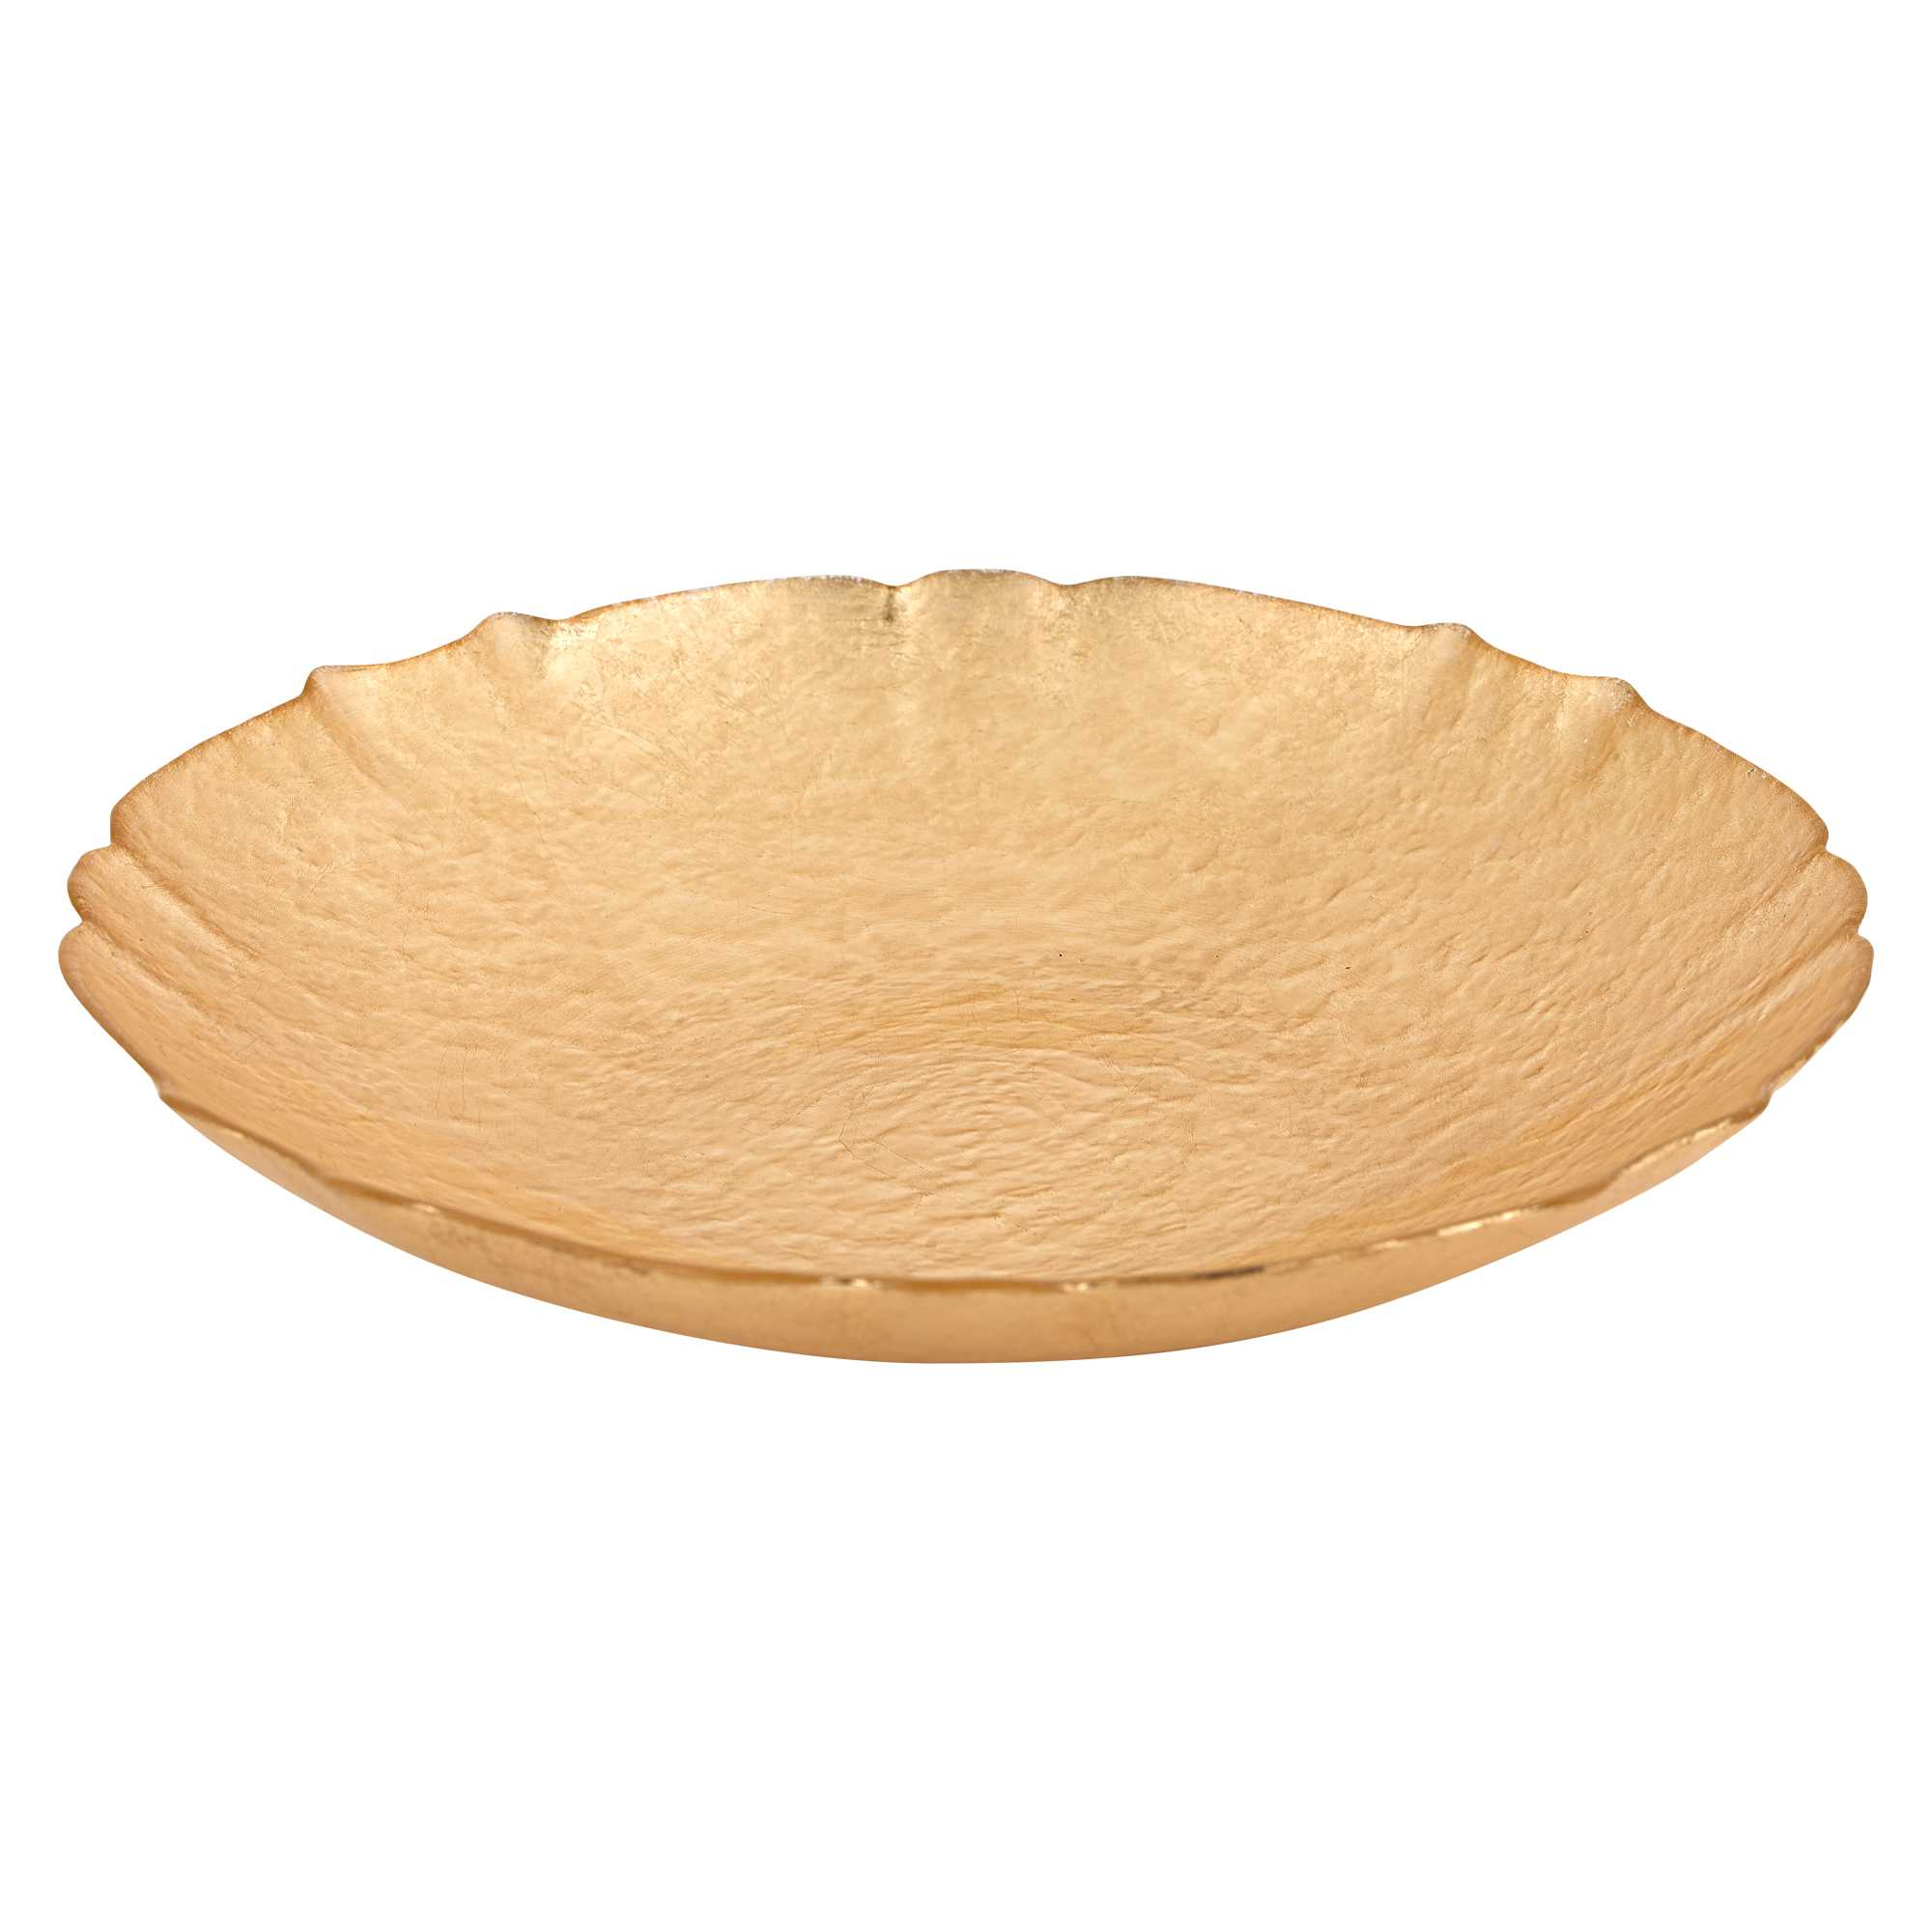 "12"" Glass Authentic Gold Leaf Centerpiece Bowl"